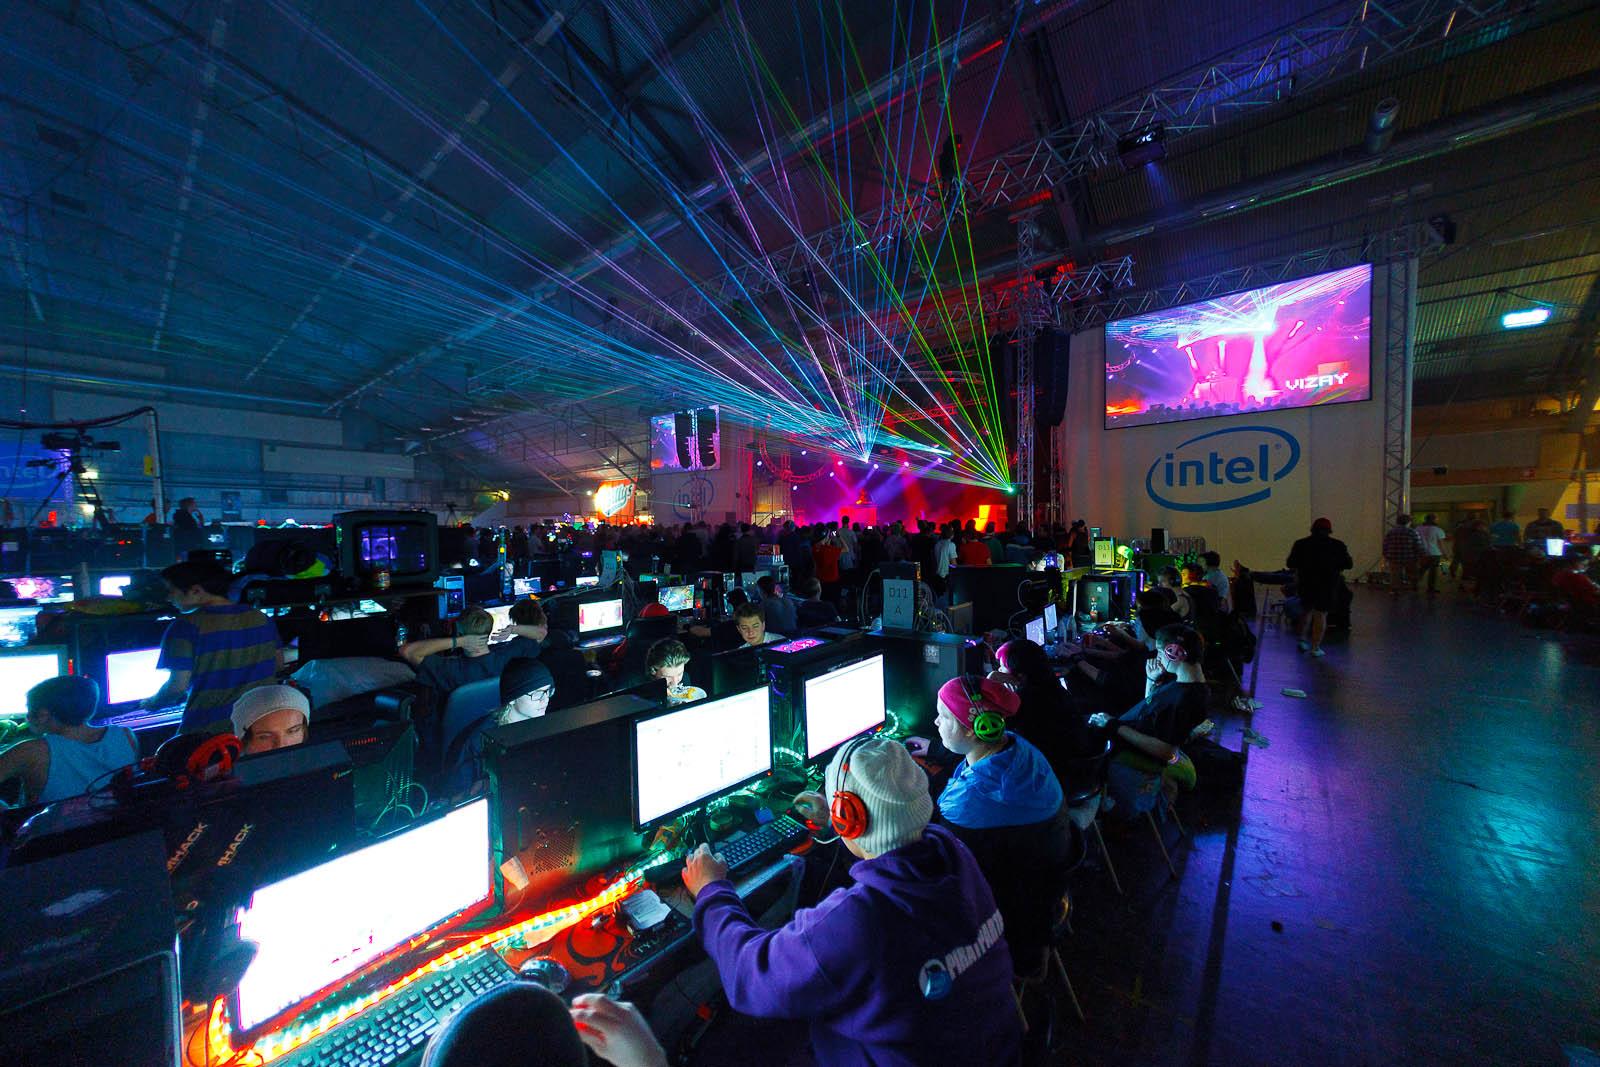 Gaming and dancing